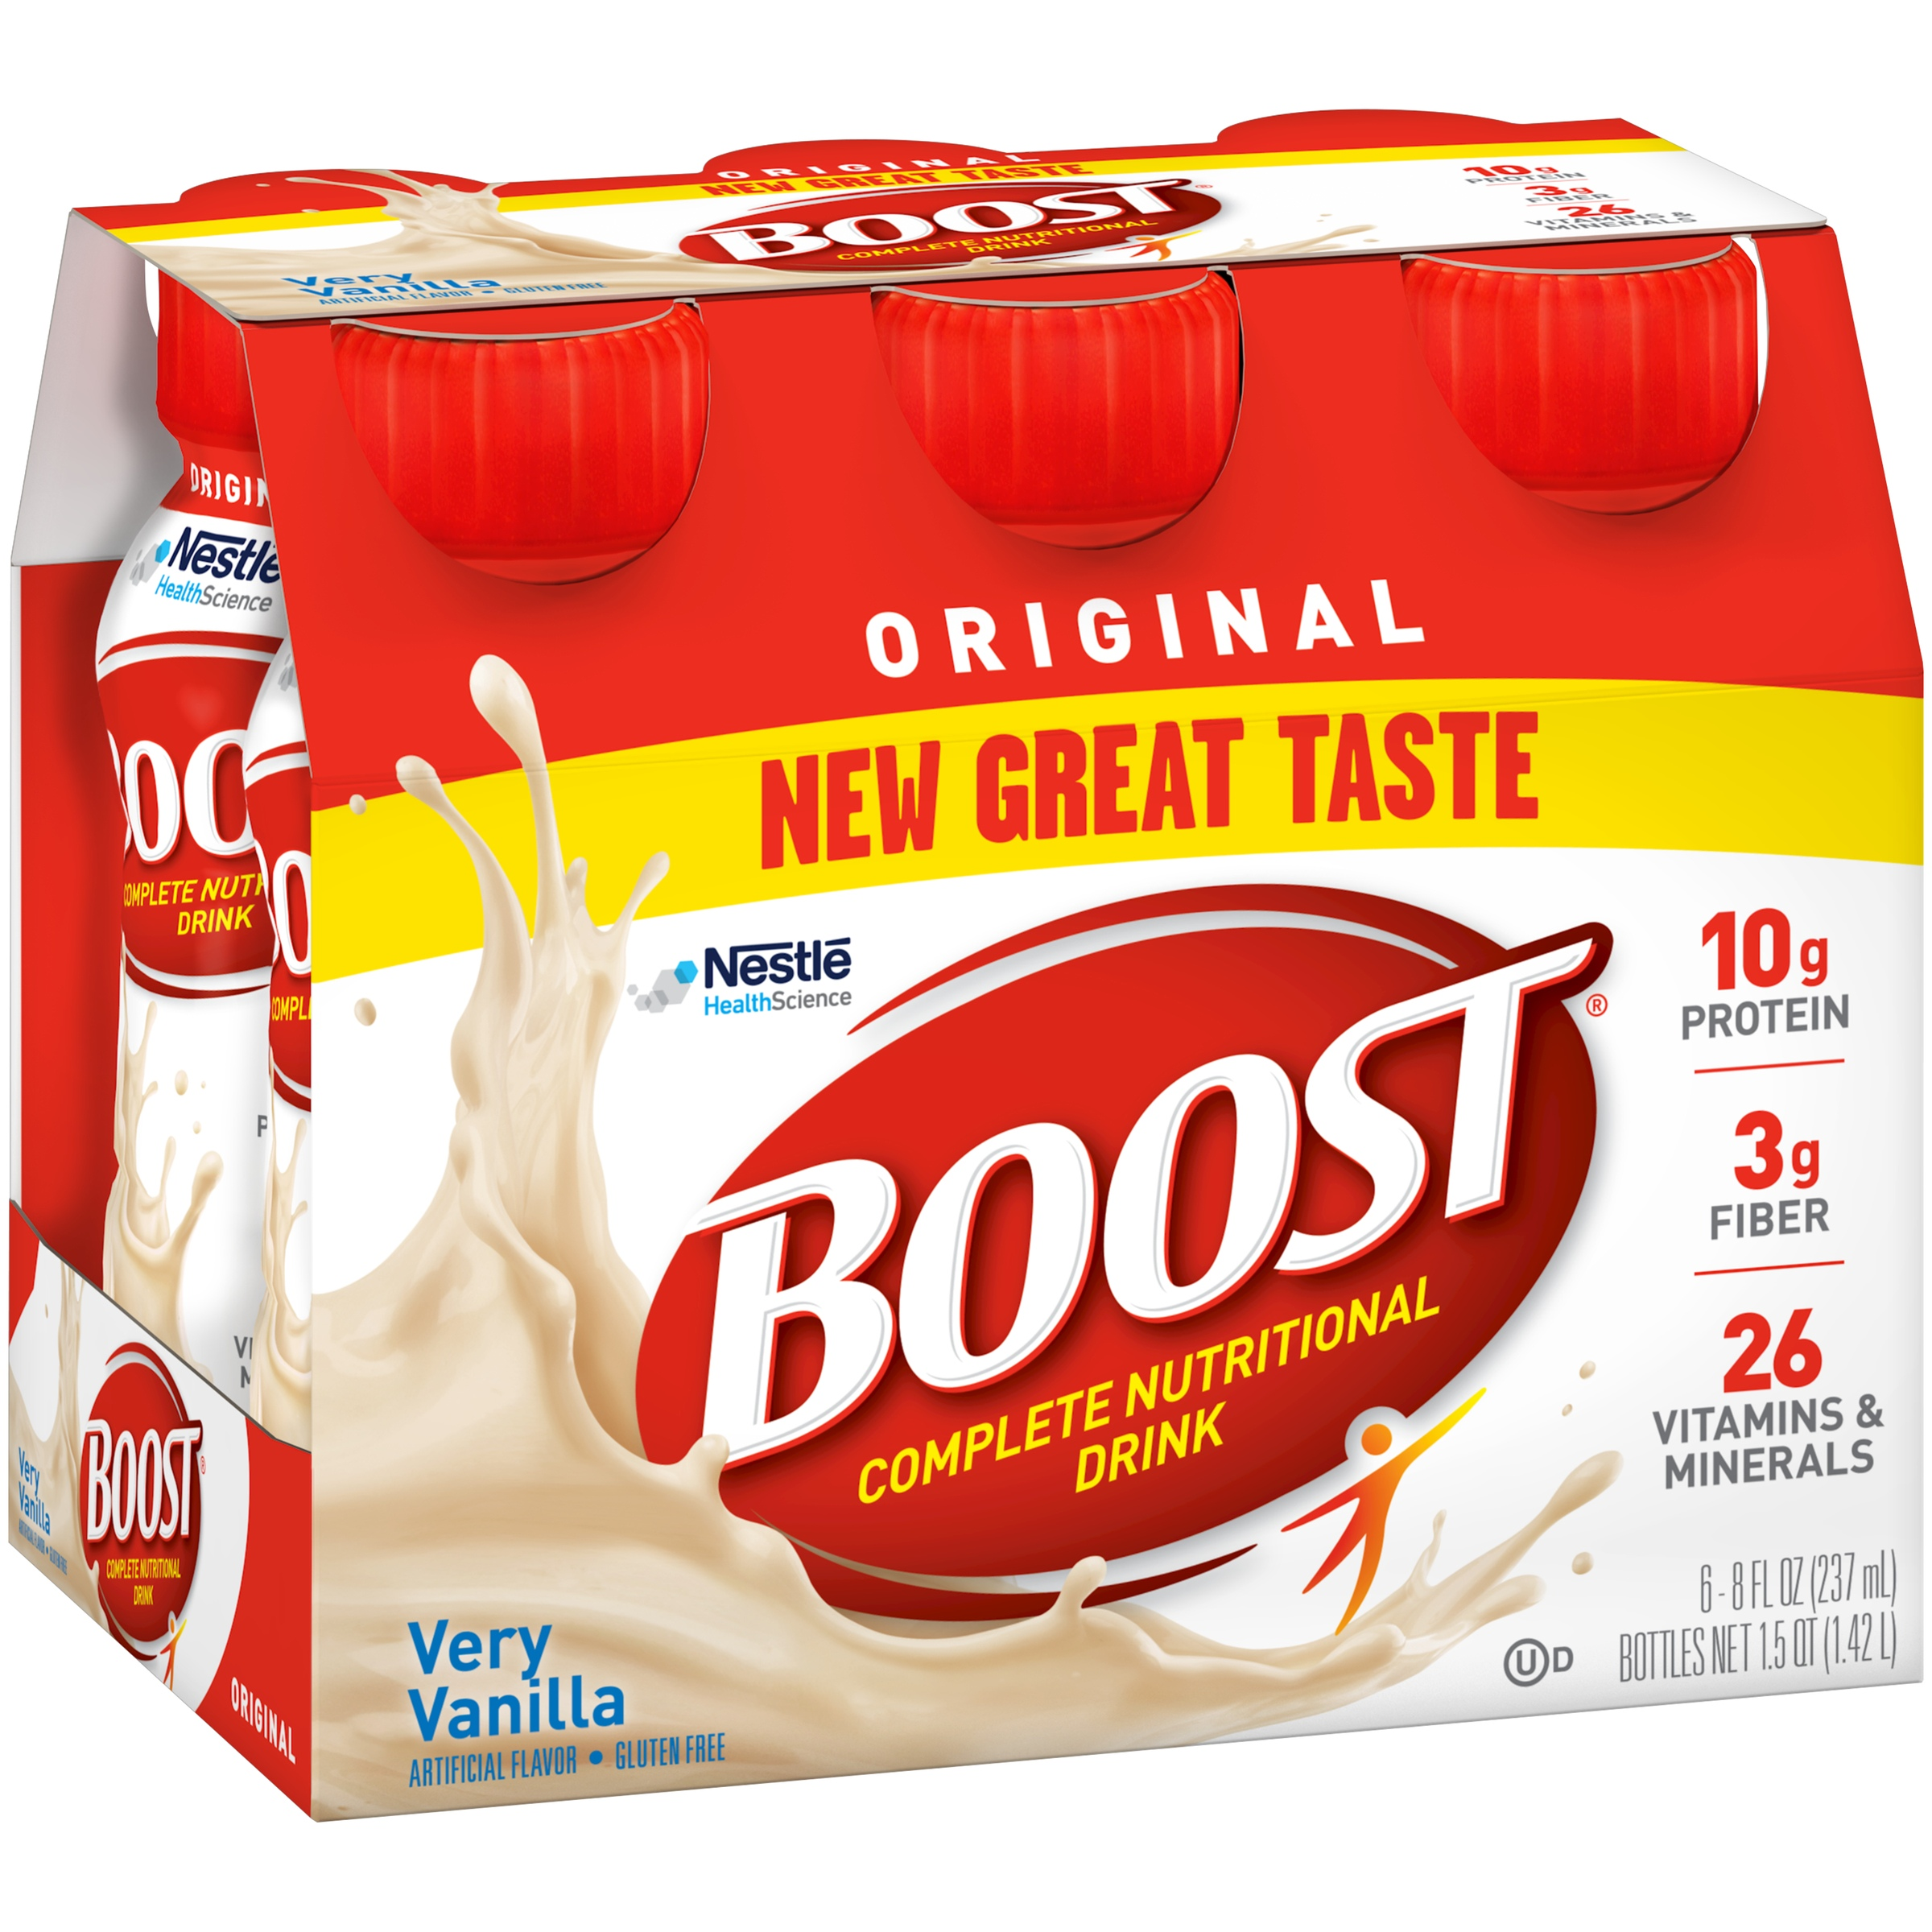 BOOST ORIGINAL Very Vanilla 6-8 fl. oz. Bottles